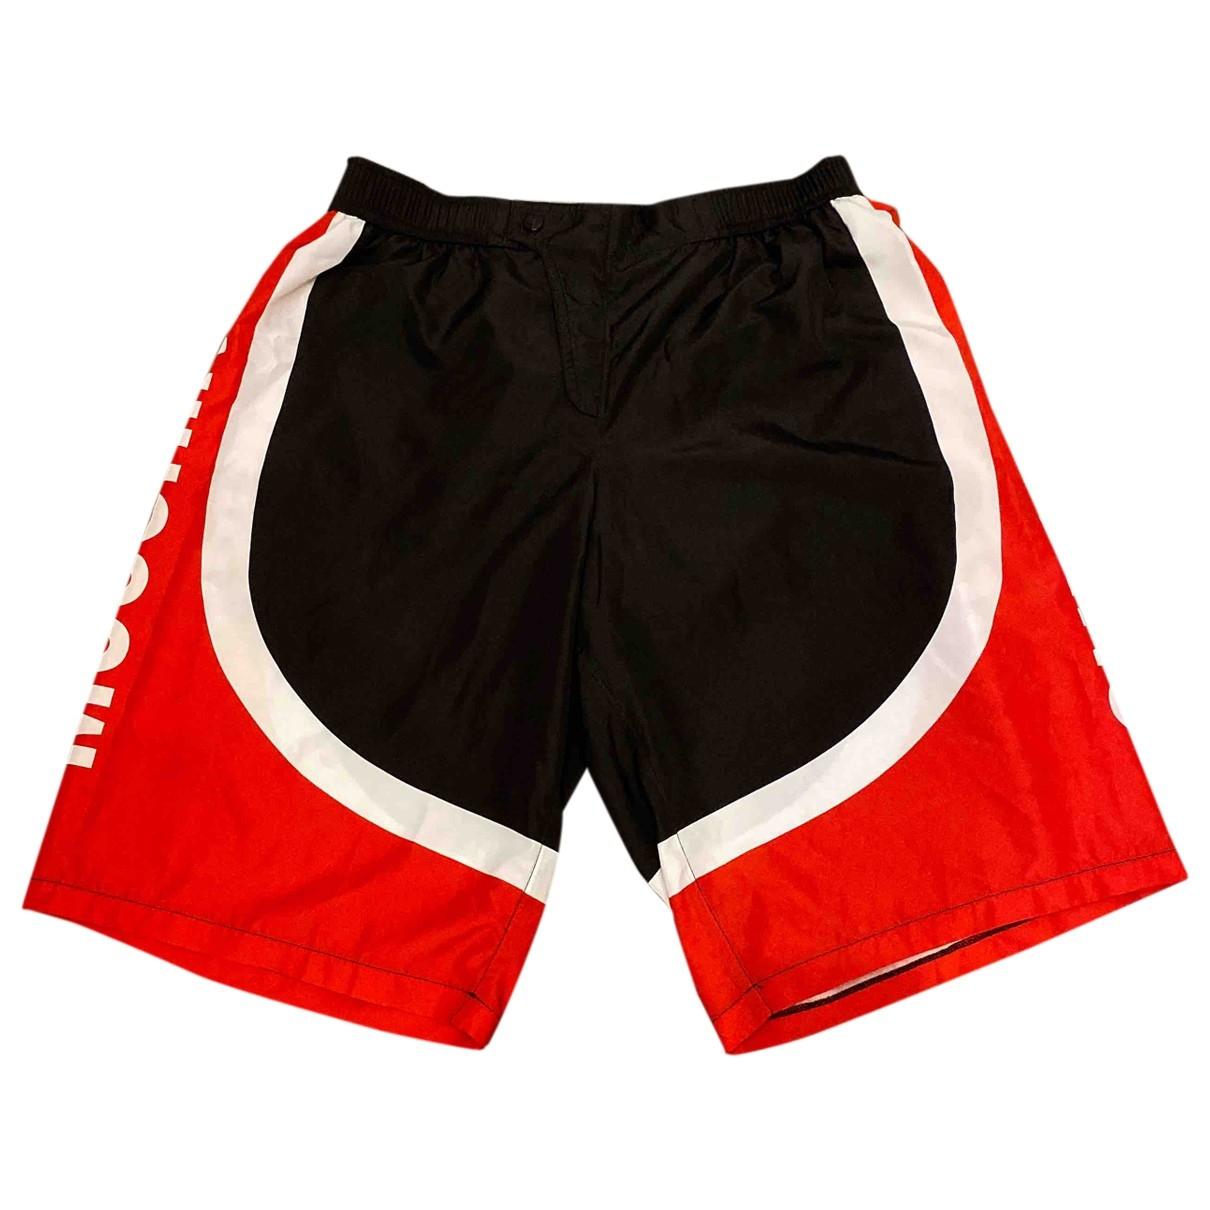 Moschino \N Multicolour Swimwear for Men L International